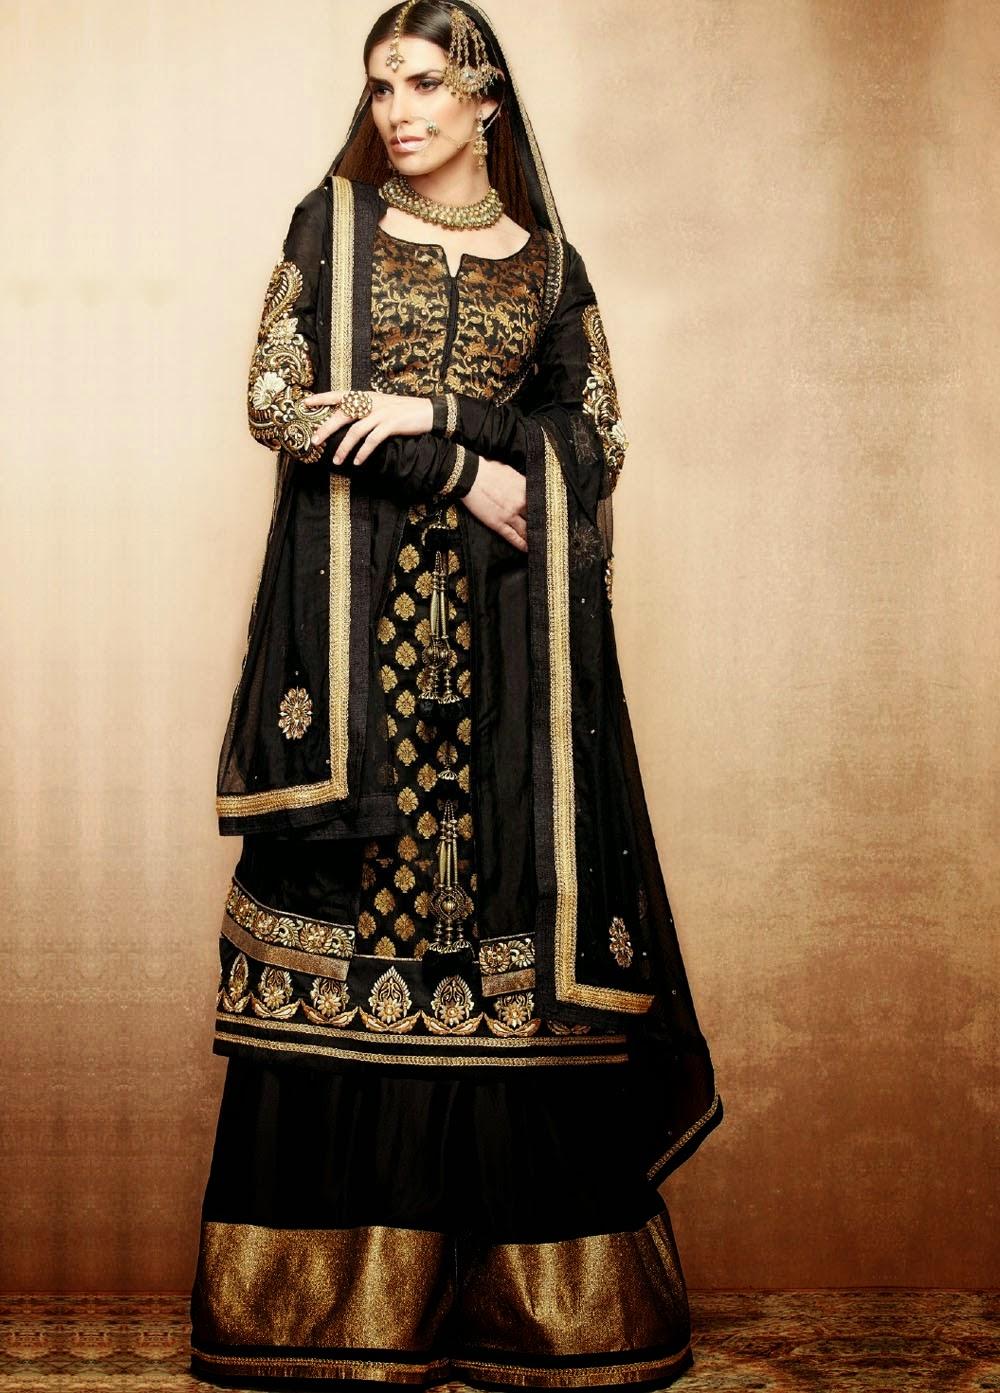 Latest Waleema Wear and Mehndi Wear Colletion 2014-15